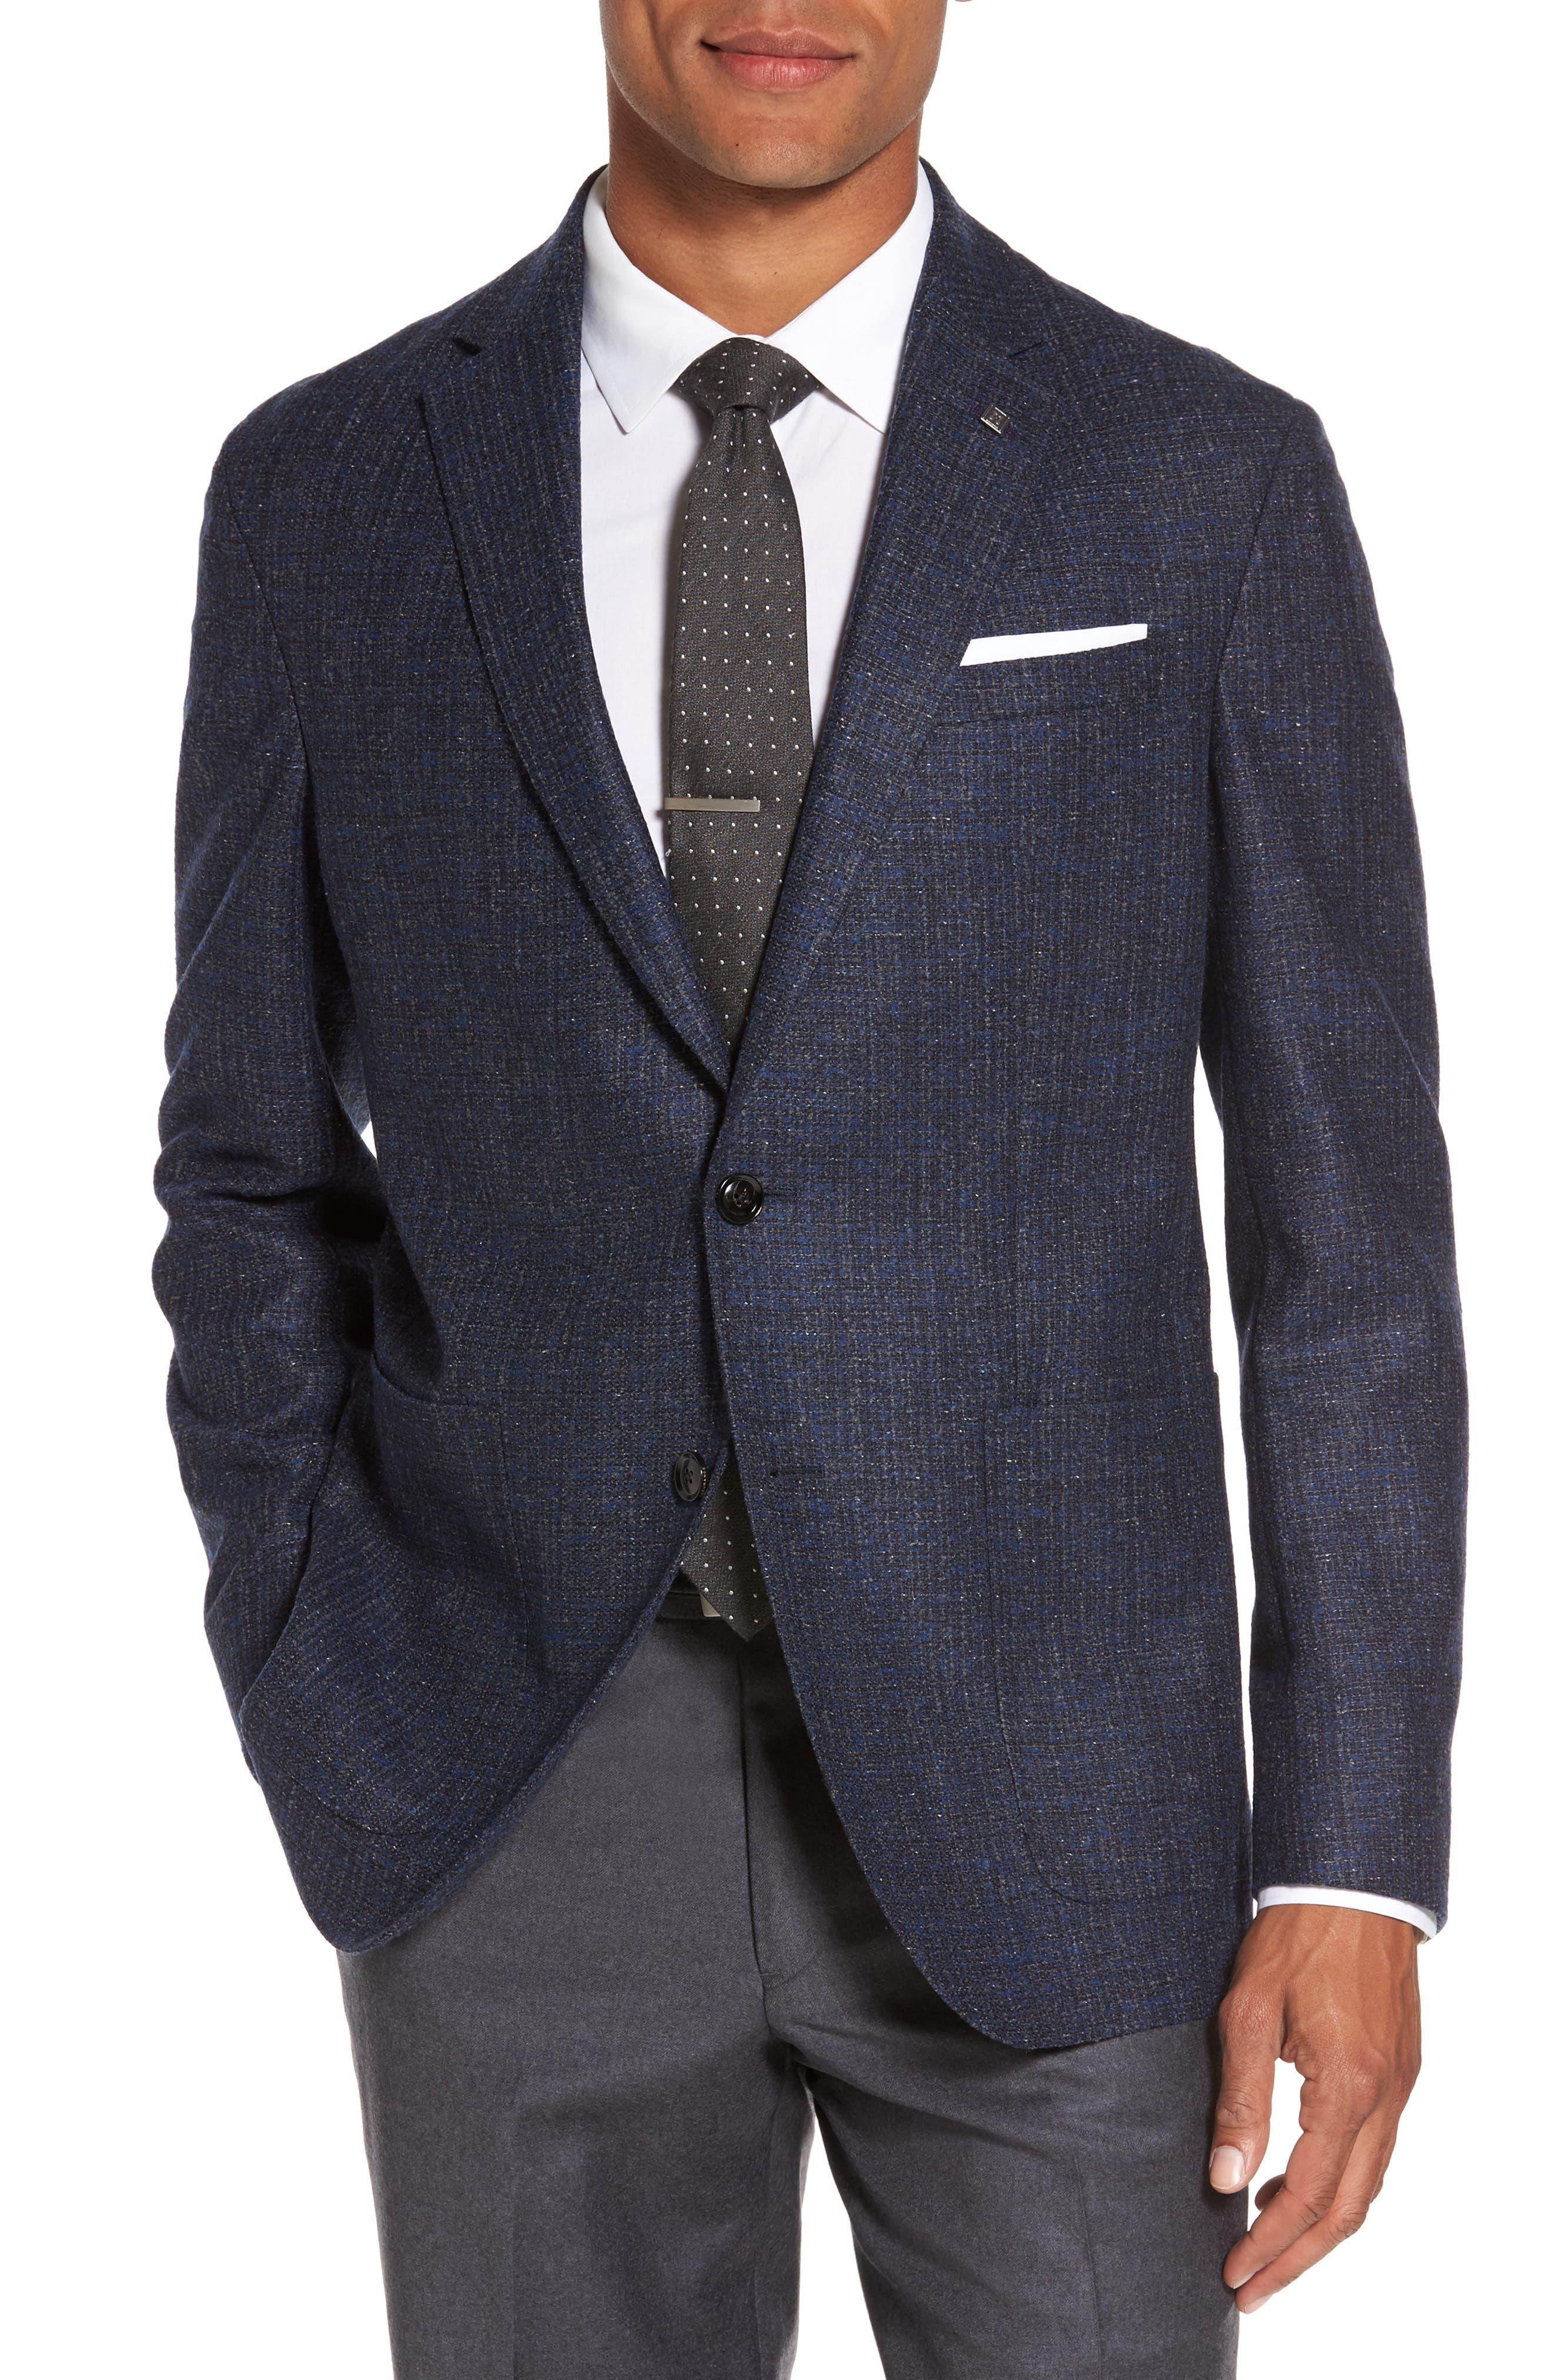 Main Image - Ted Baker London Kyle Trim Fit Wool Blend Blazer